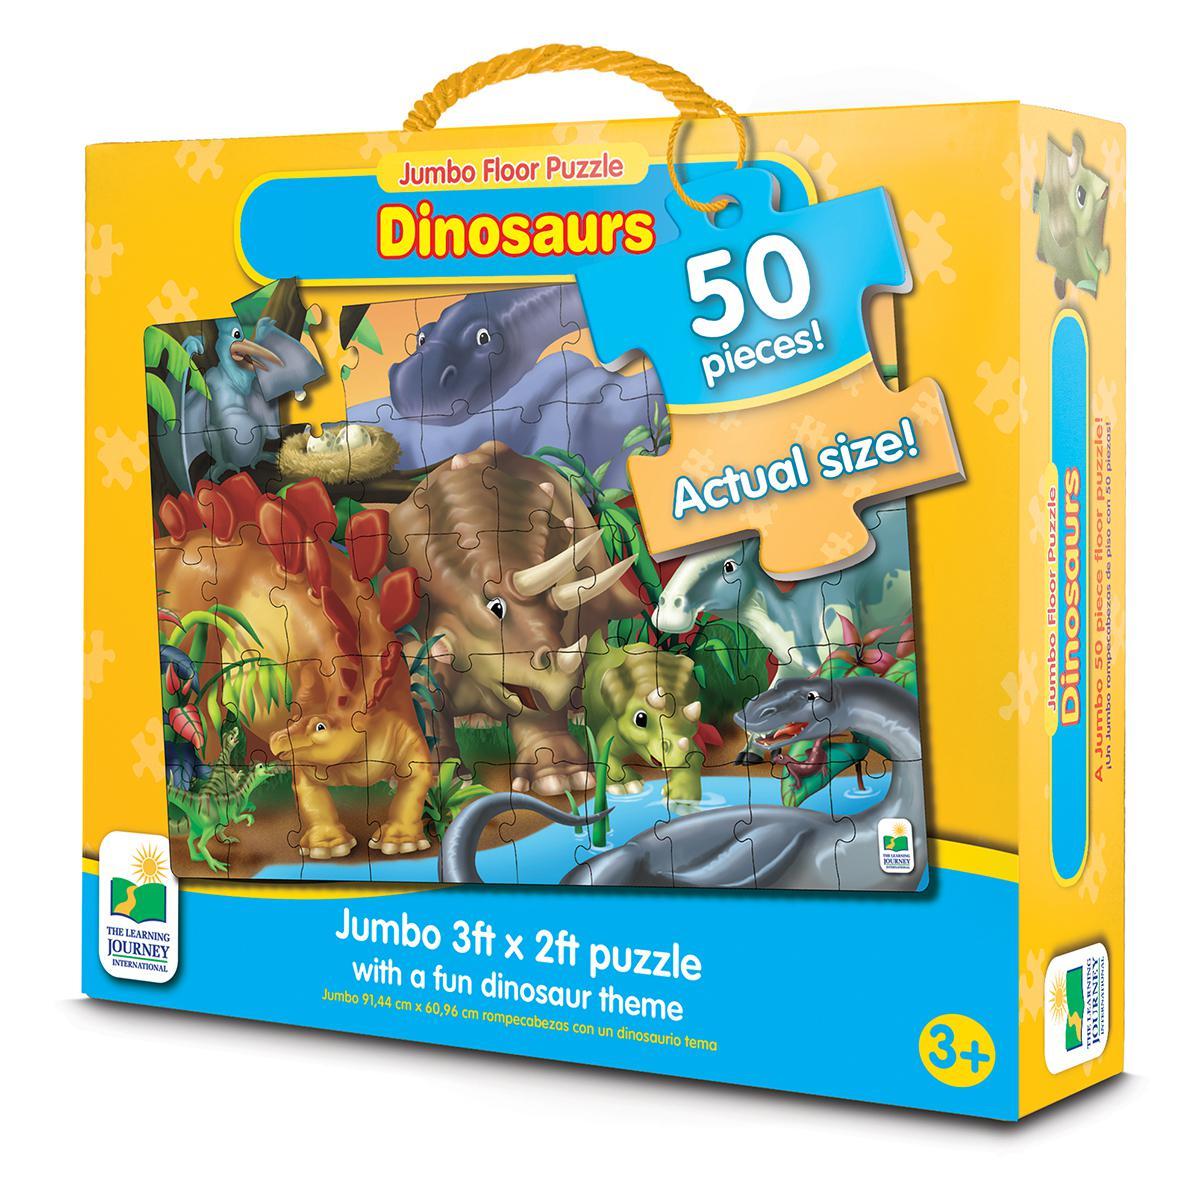 Jumbo Floor Puzzle Dinosaurs